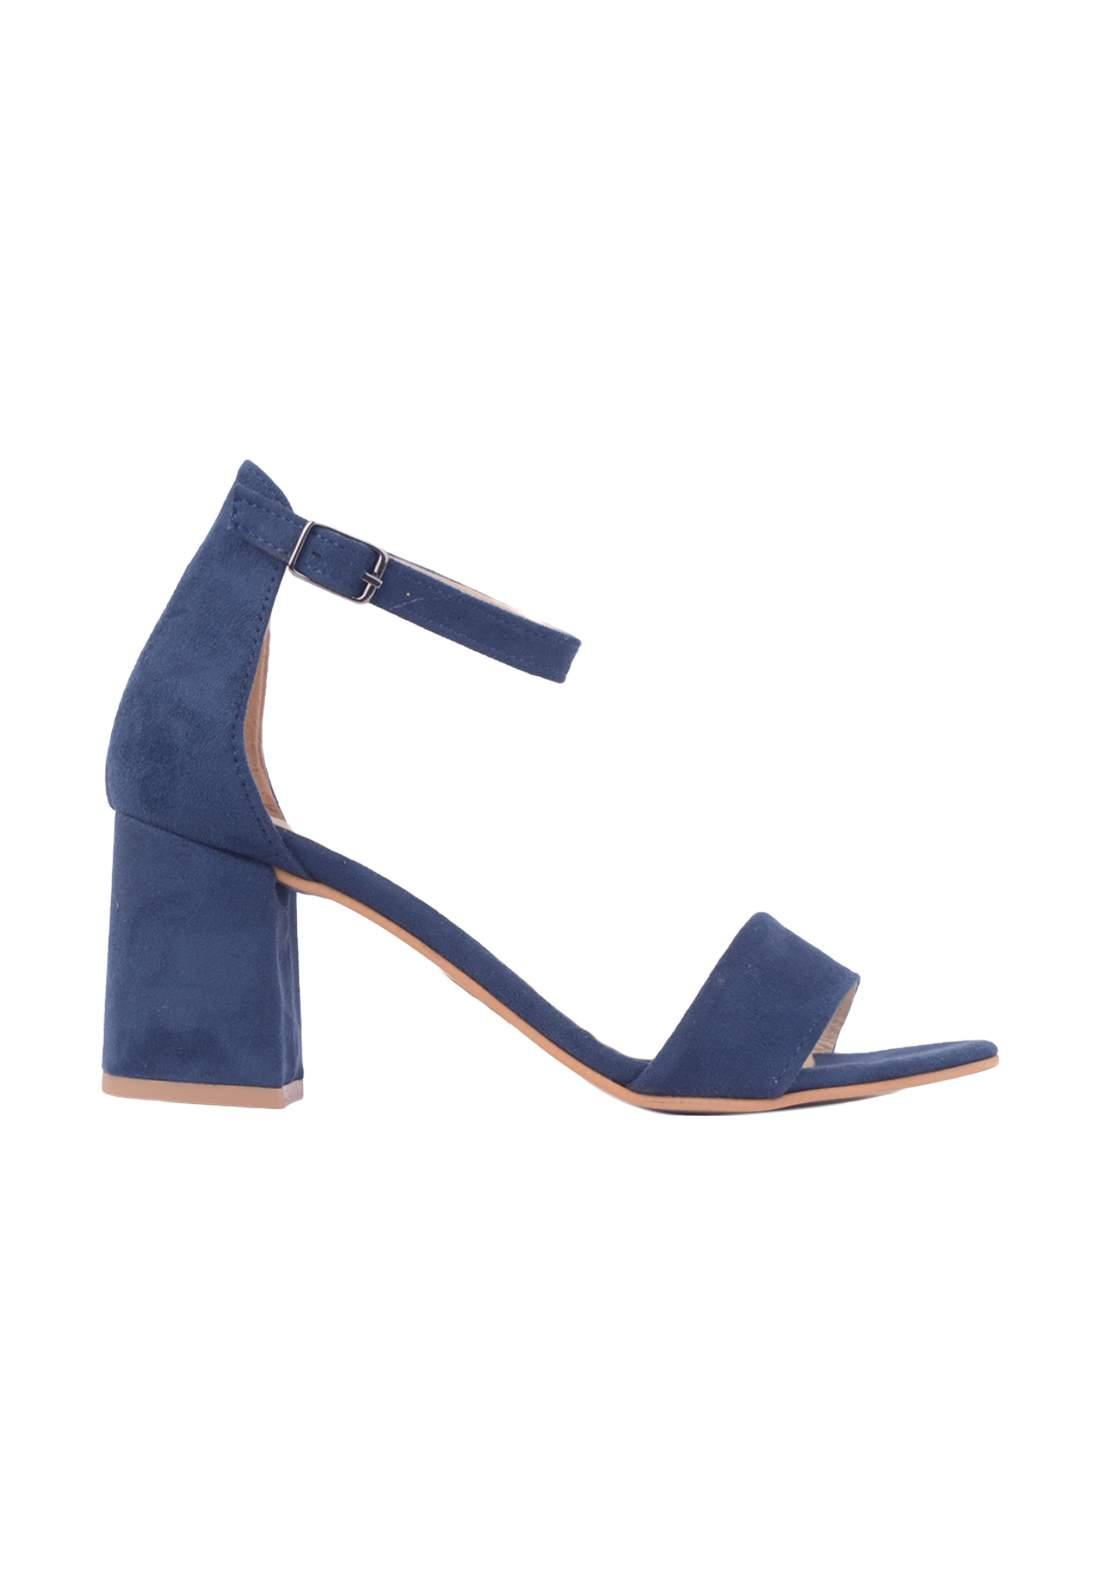 حذاء كعب نسائي ازرق اللون